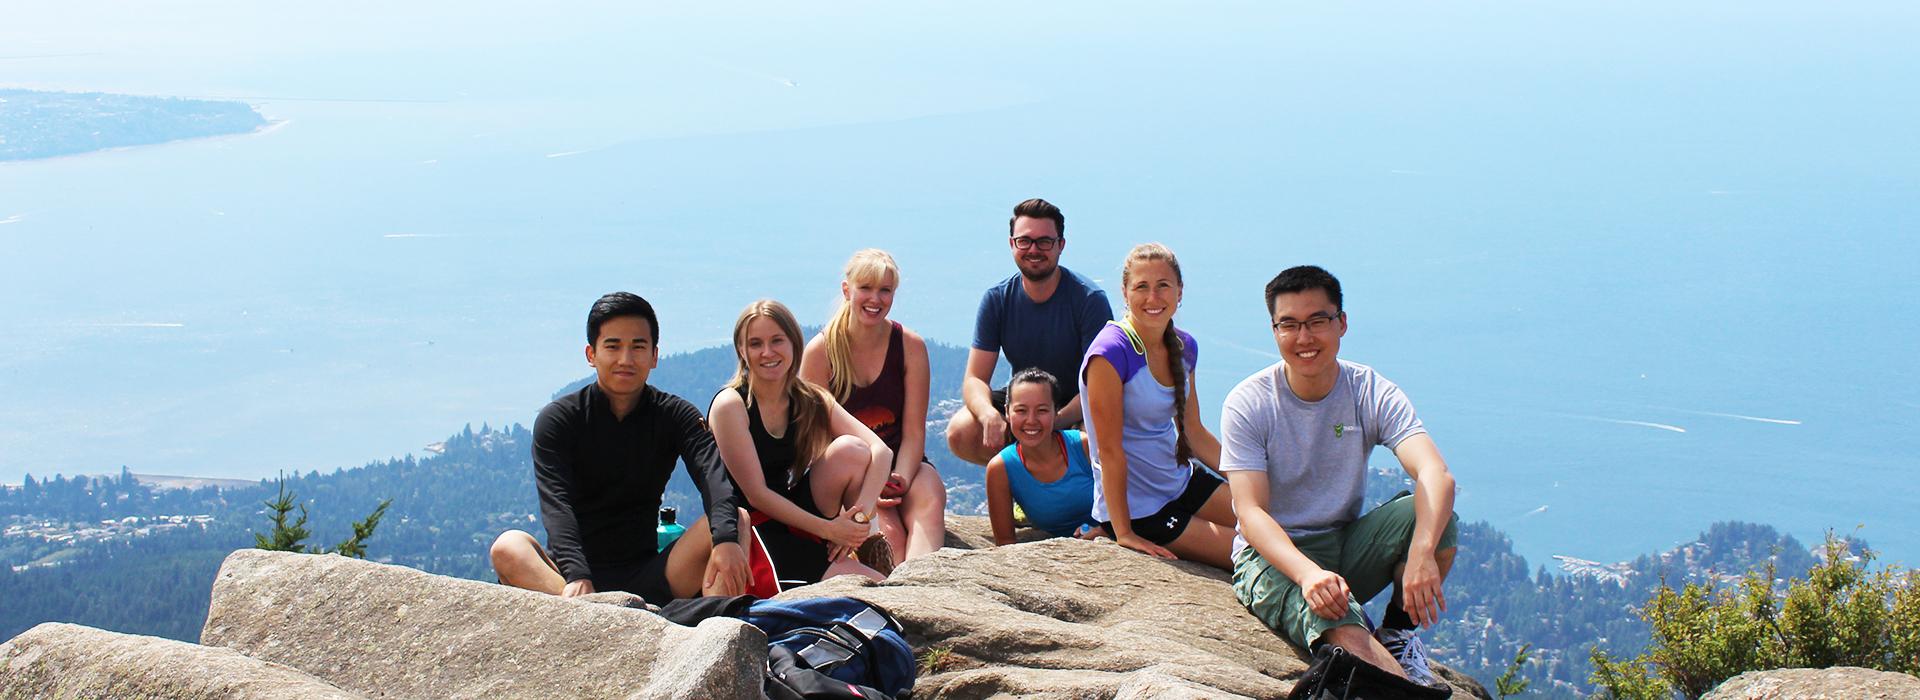 MD/PhD Program | MD Undergrad Education, UBC Faculty of Medicine